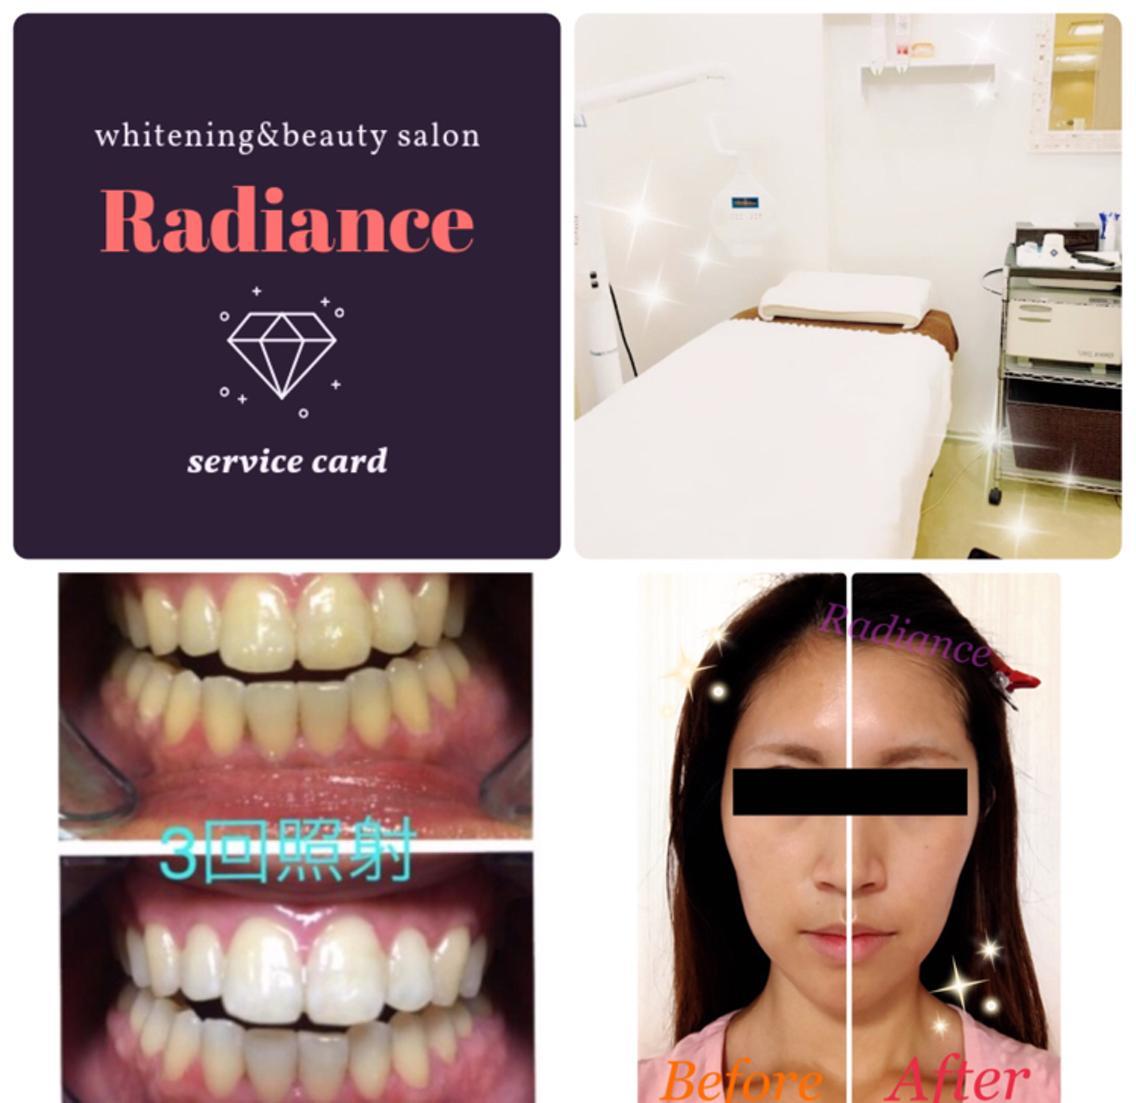 Radiance所属・Radiance(すすきの&菊水店)の掲載